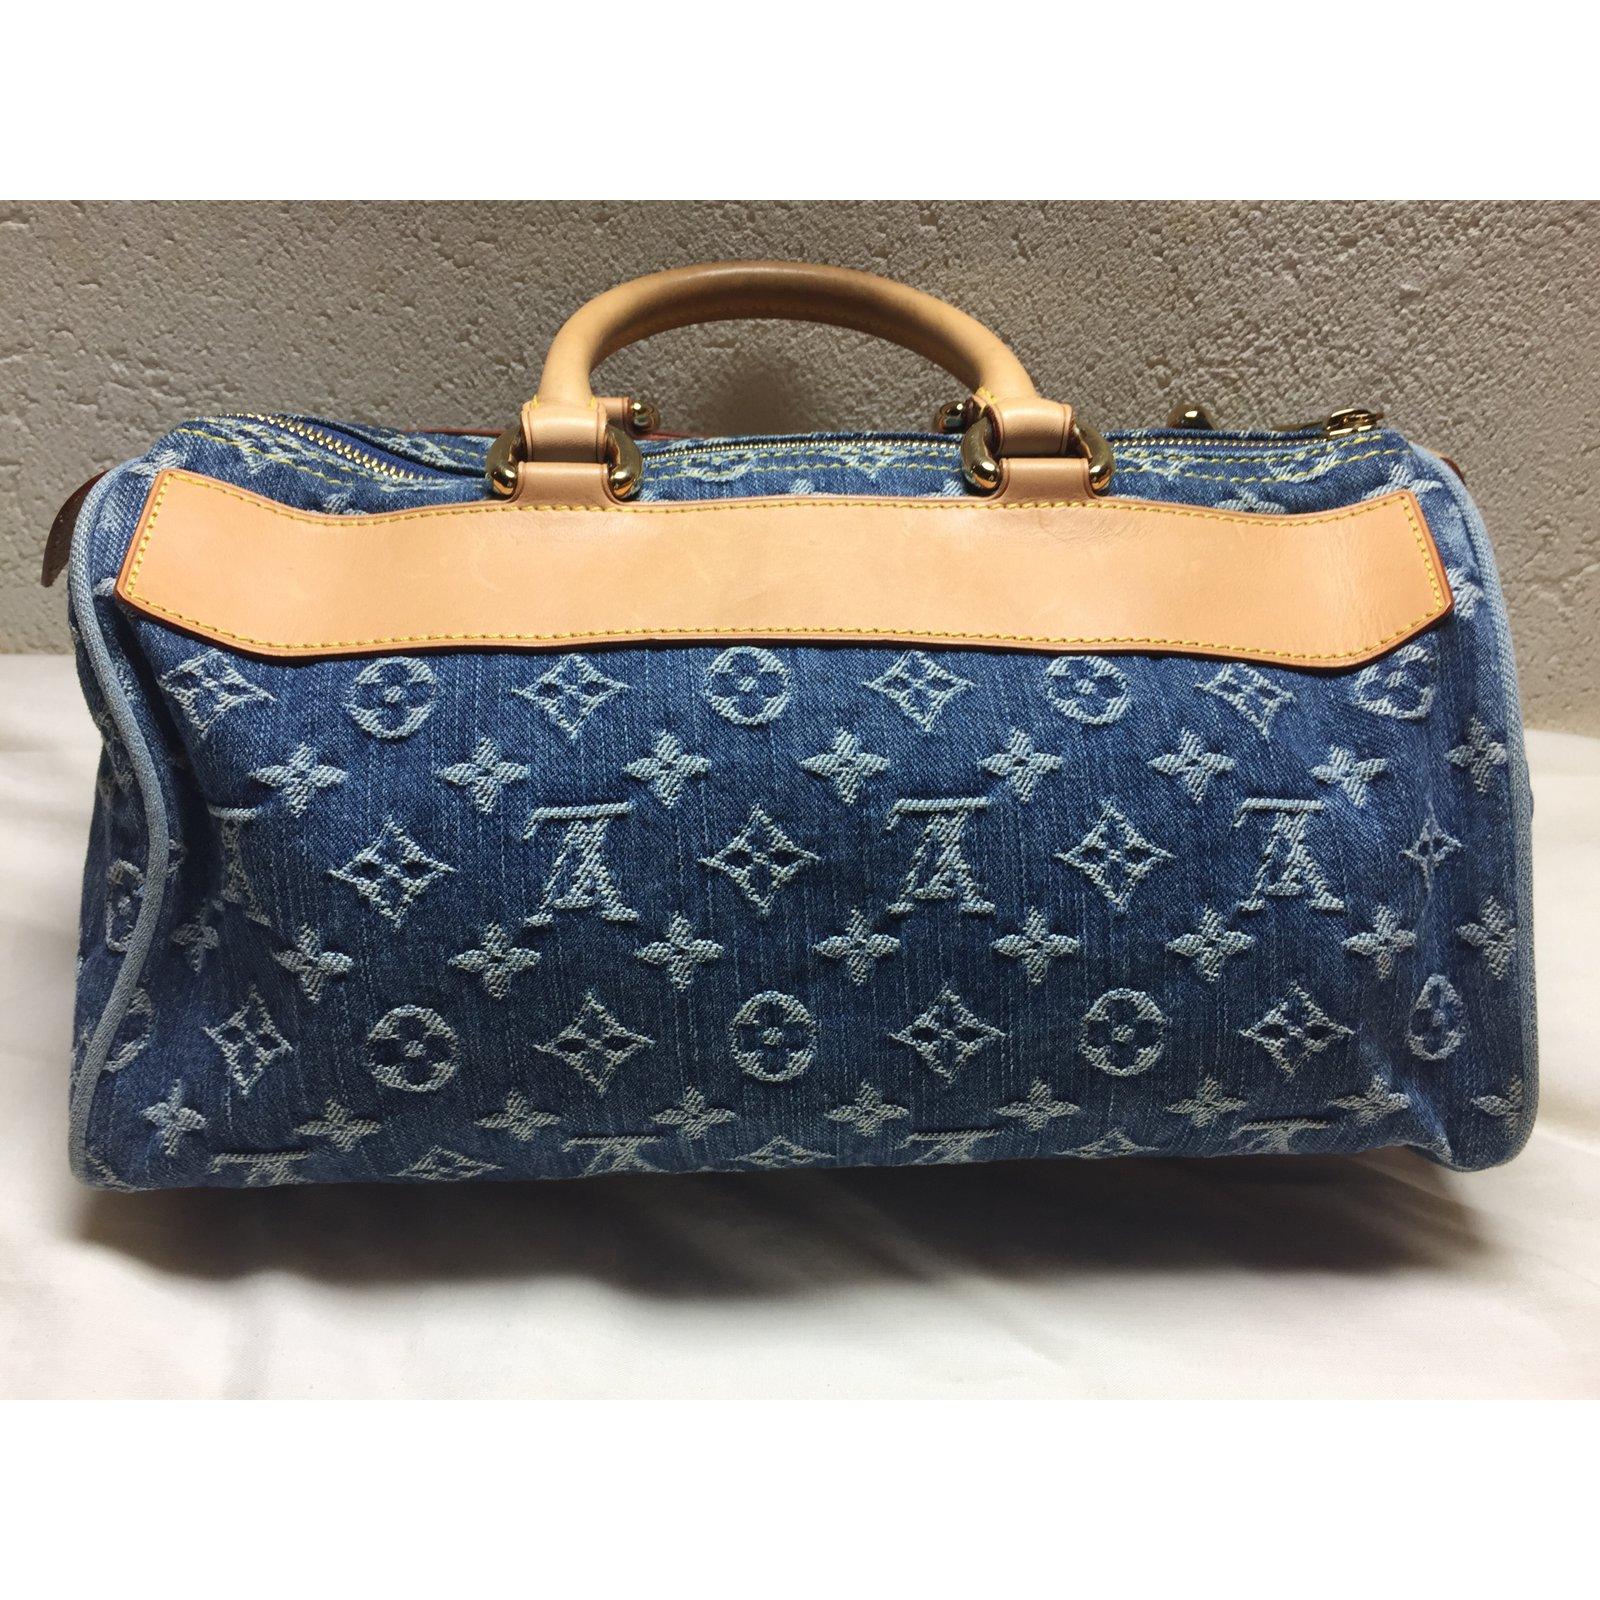 Sacs à main Louis Vuitton Speedy neo denim Jean Bleu ref.40951 - Joli Closet 22655f8d96f